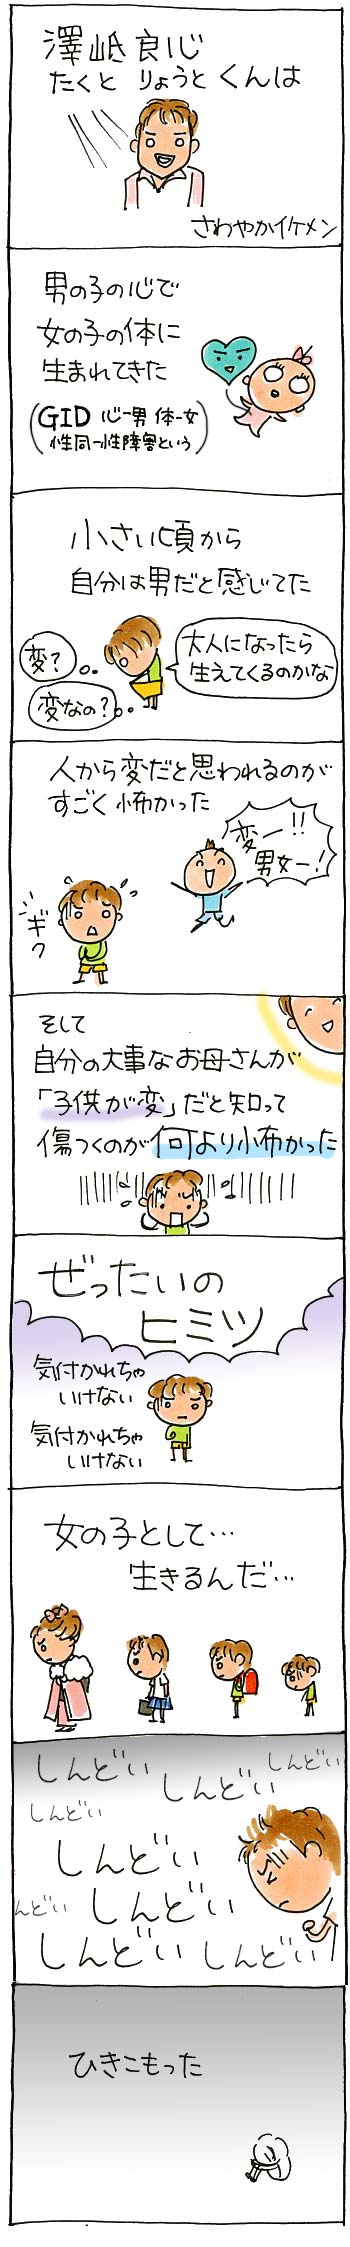 ryo022.jpg